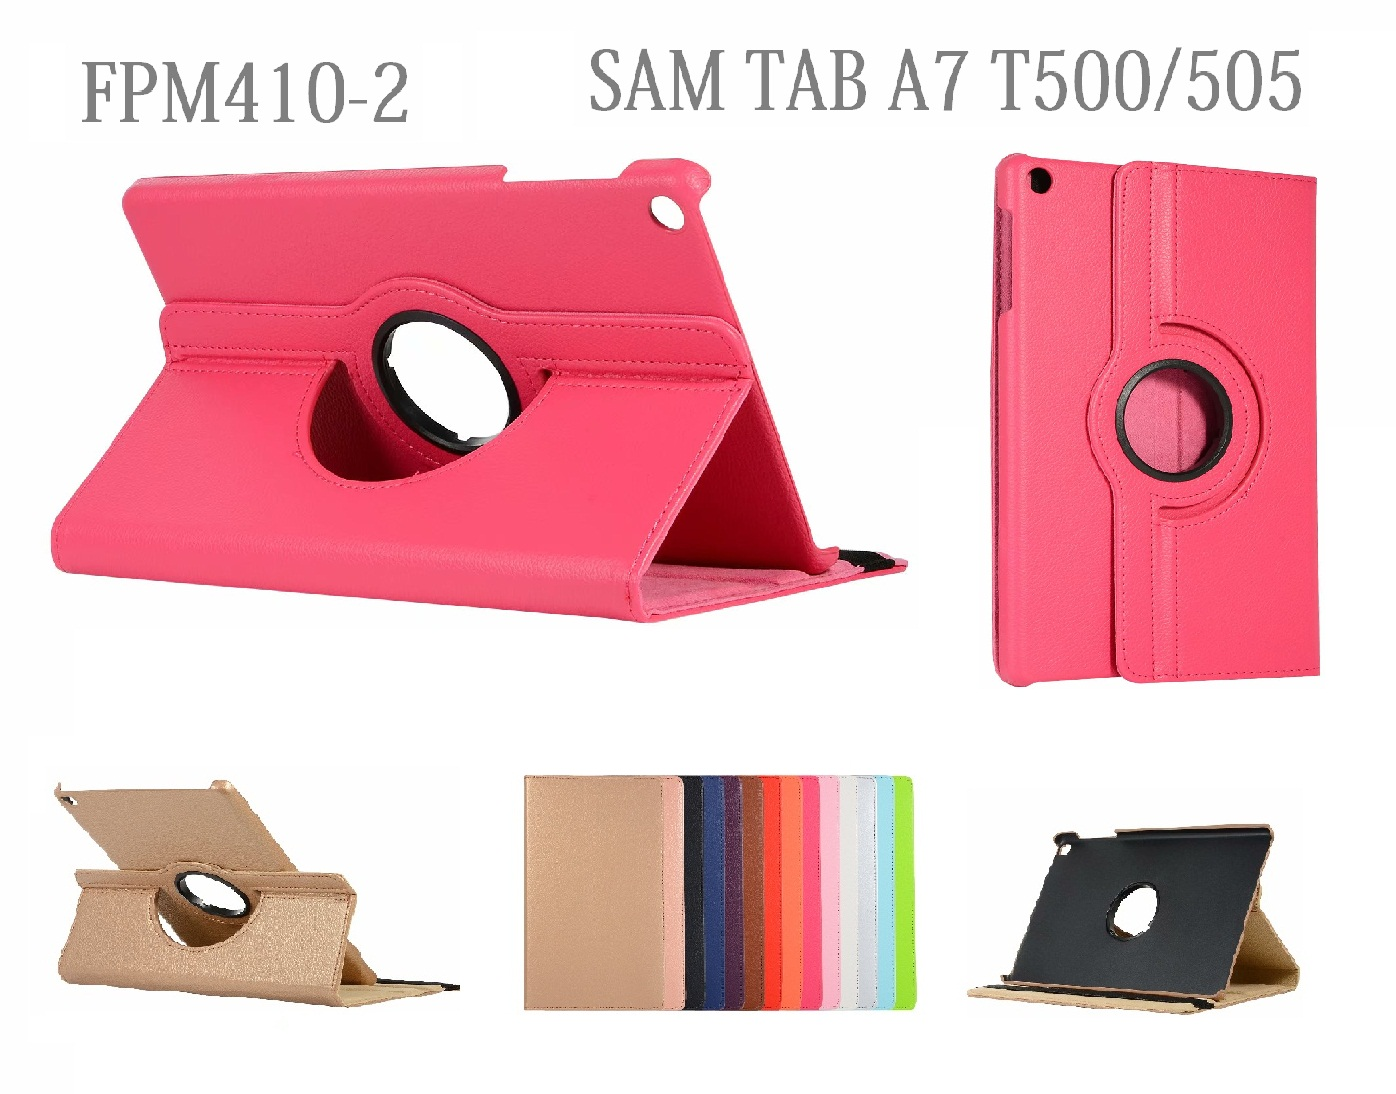 Funda Giratoria para SAM TAB A7 T500/505 FPM410